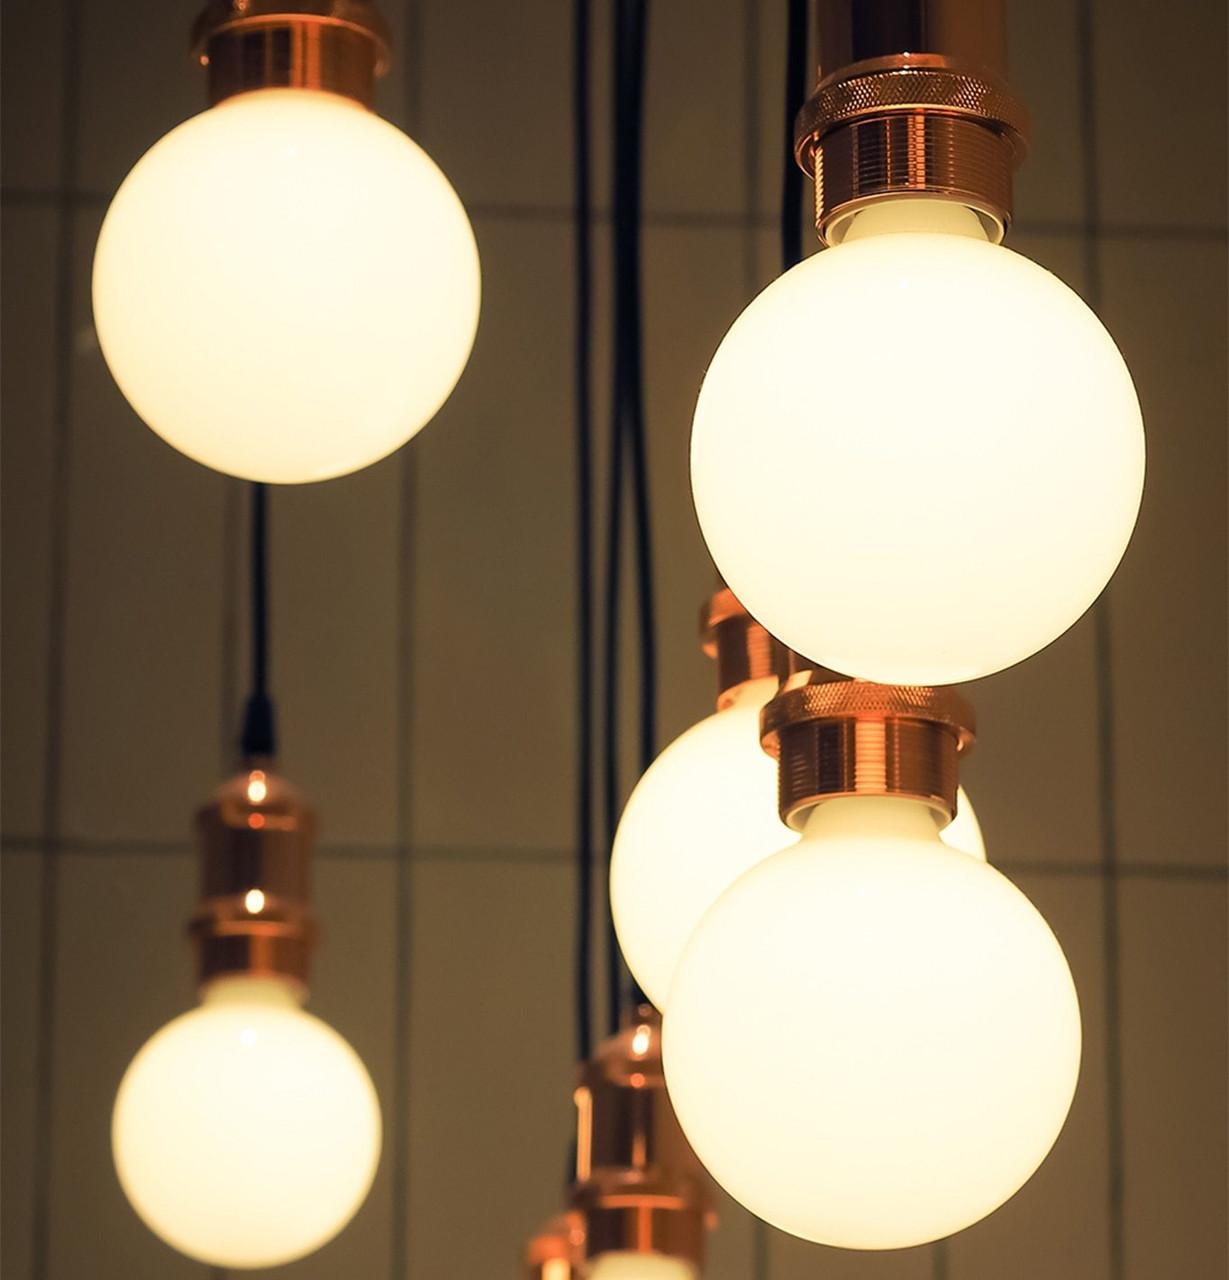 Crompton Lamps LED G125 2200K Light Bulbs